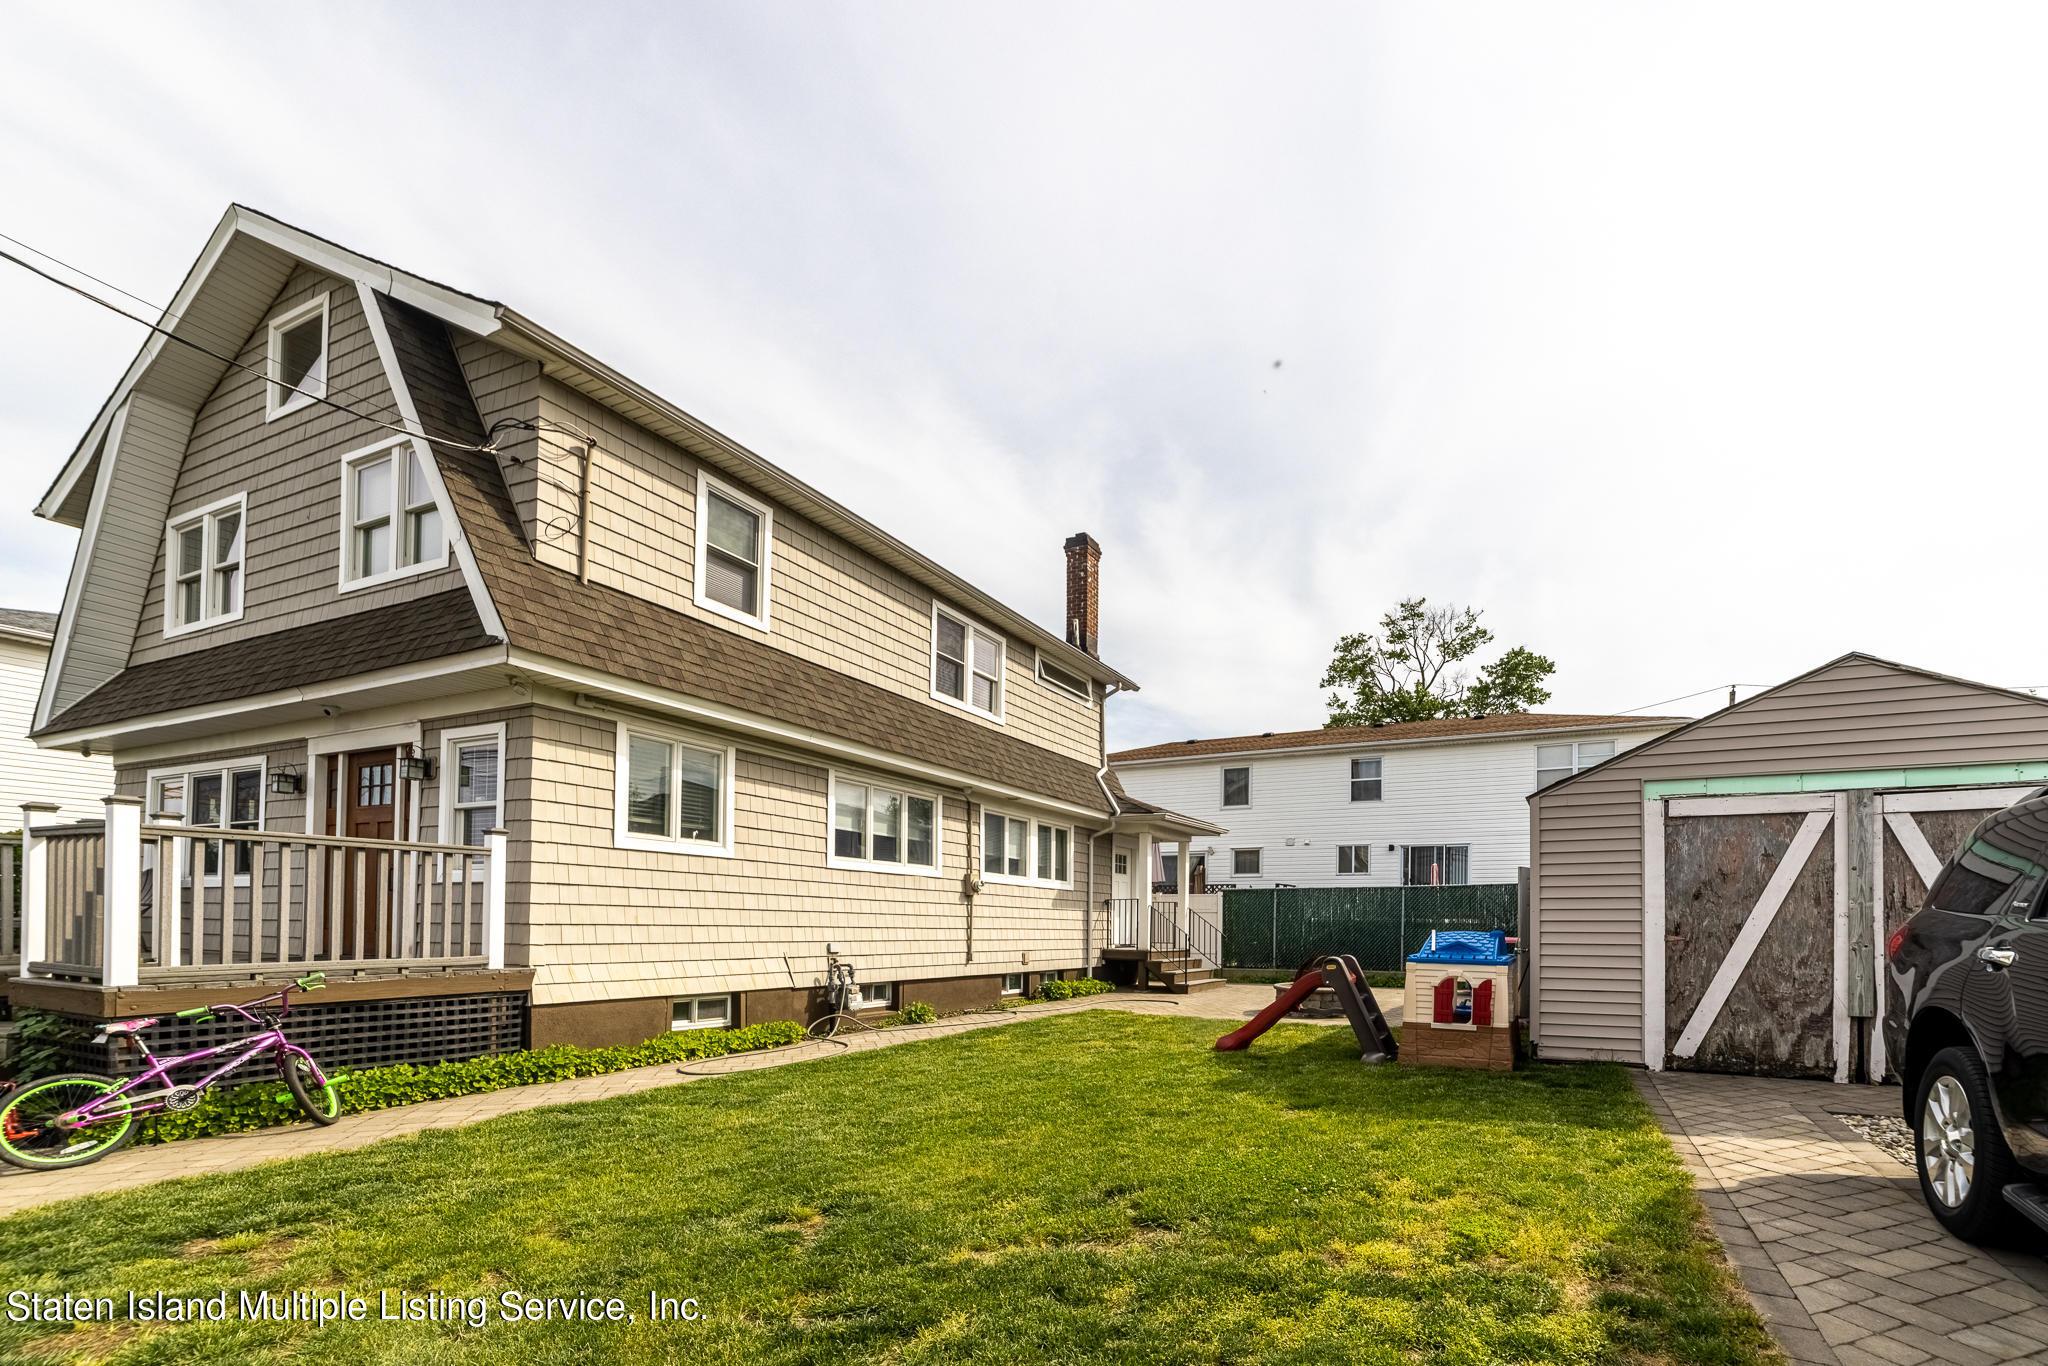 Single Family - Detached 790 New Dorp Lane  Staten Island, NY 10306, MLS-1146574-2